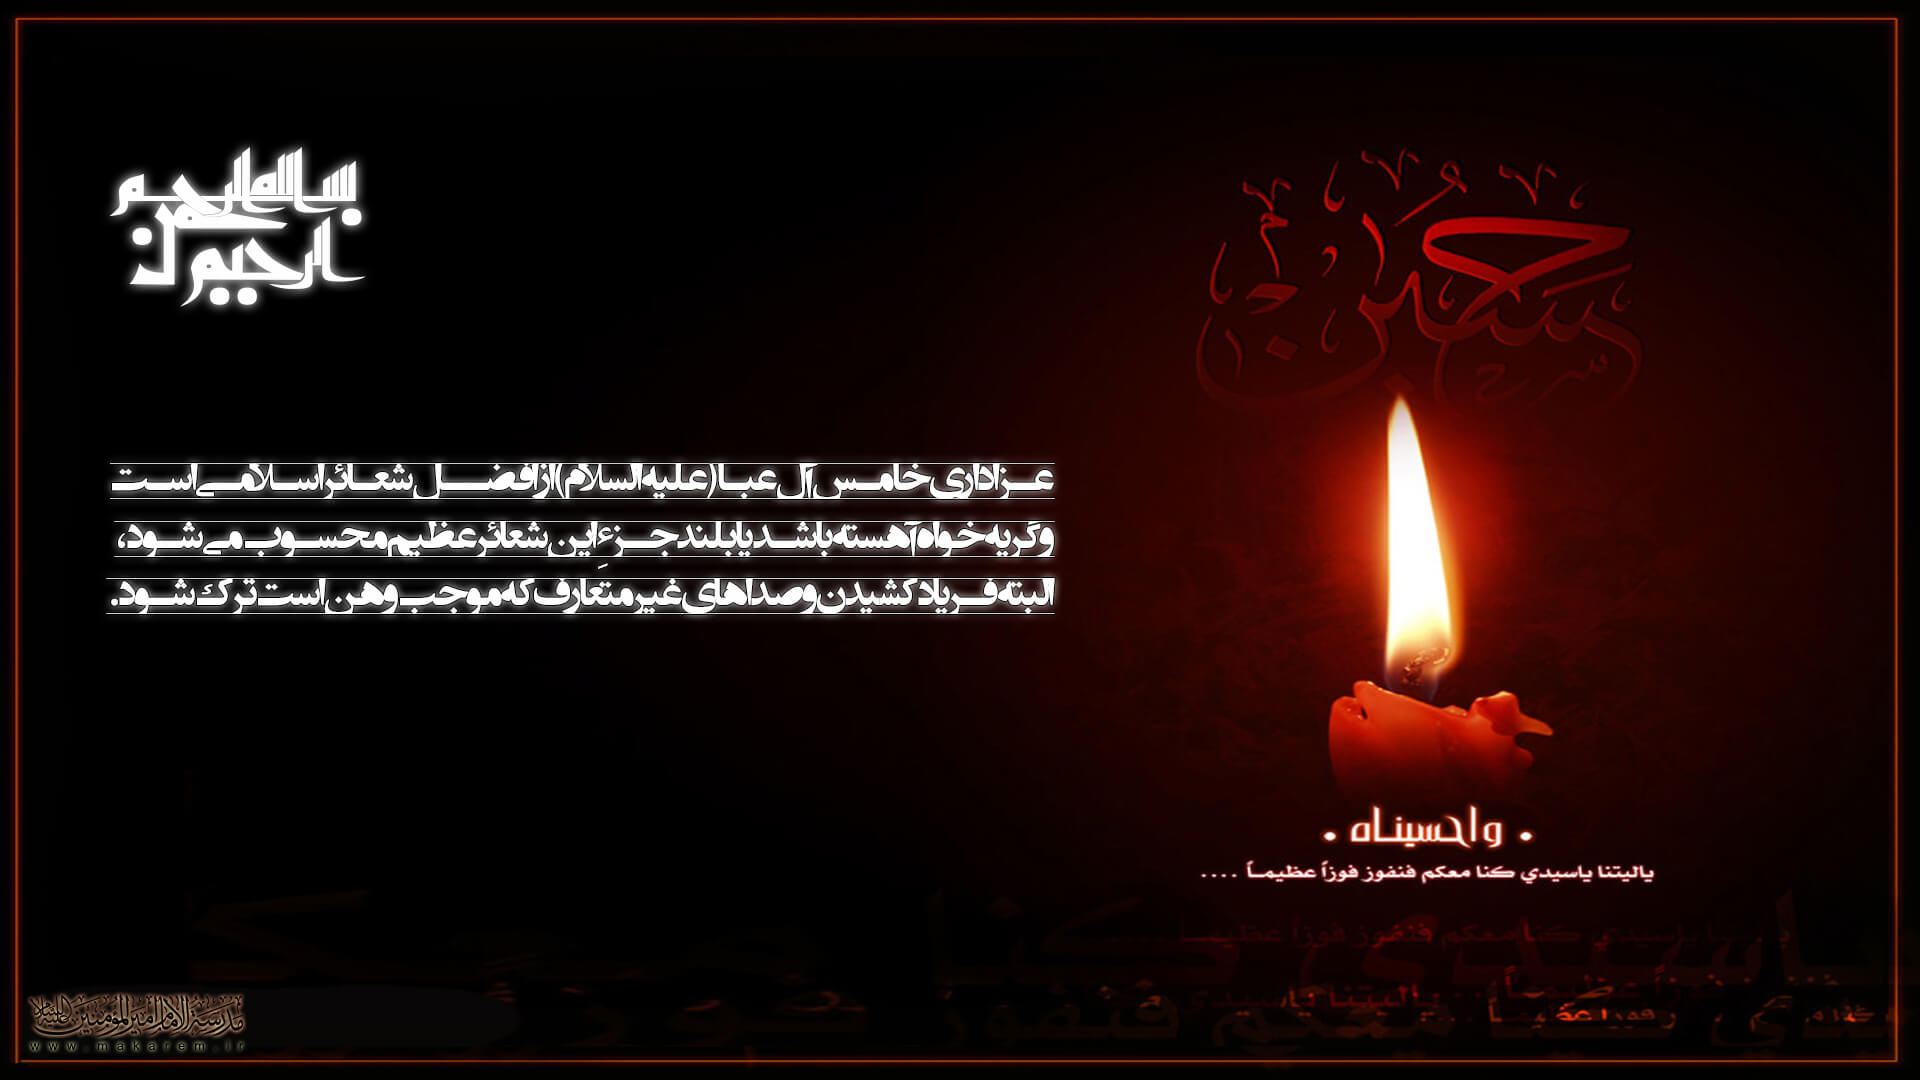 احکام عزاداری 03-مدرسه الامام امیر المومنین (ع)